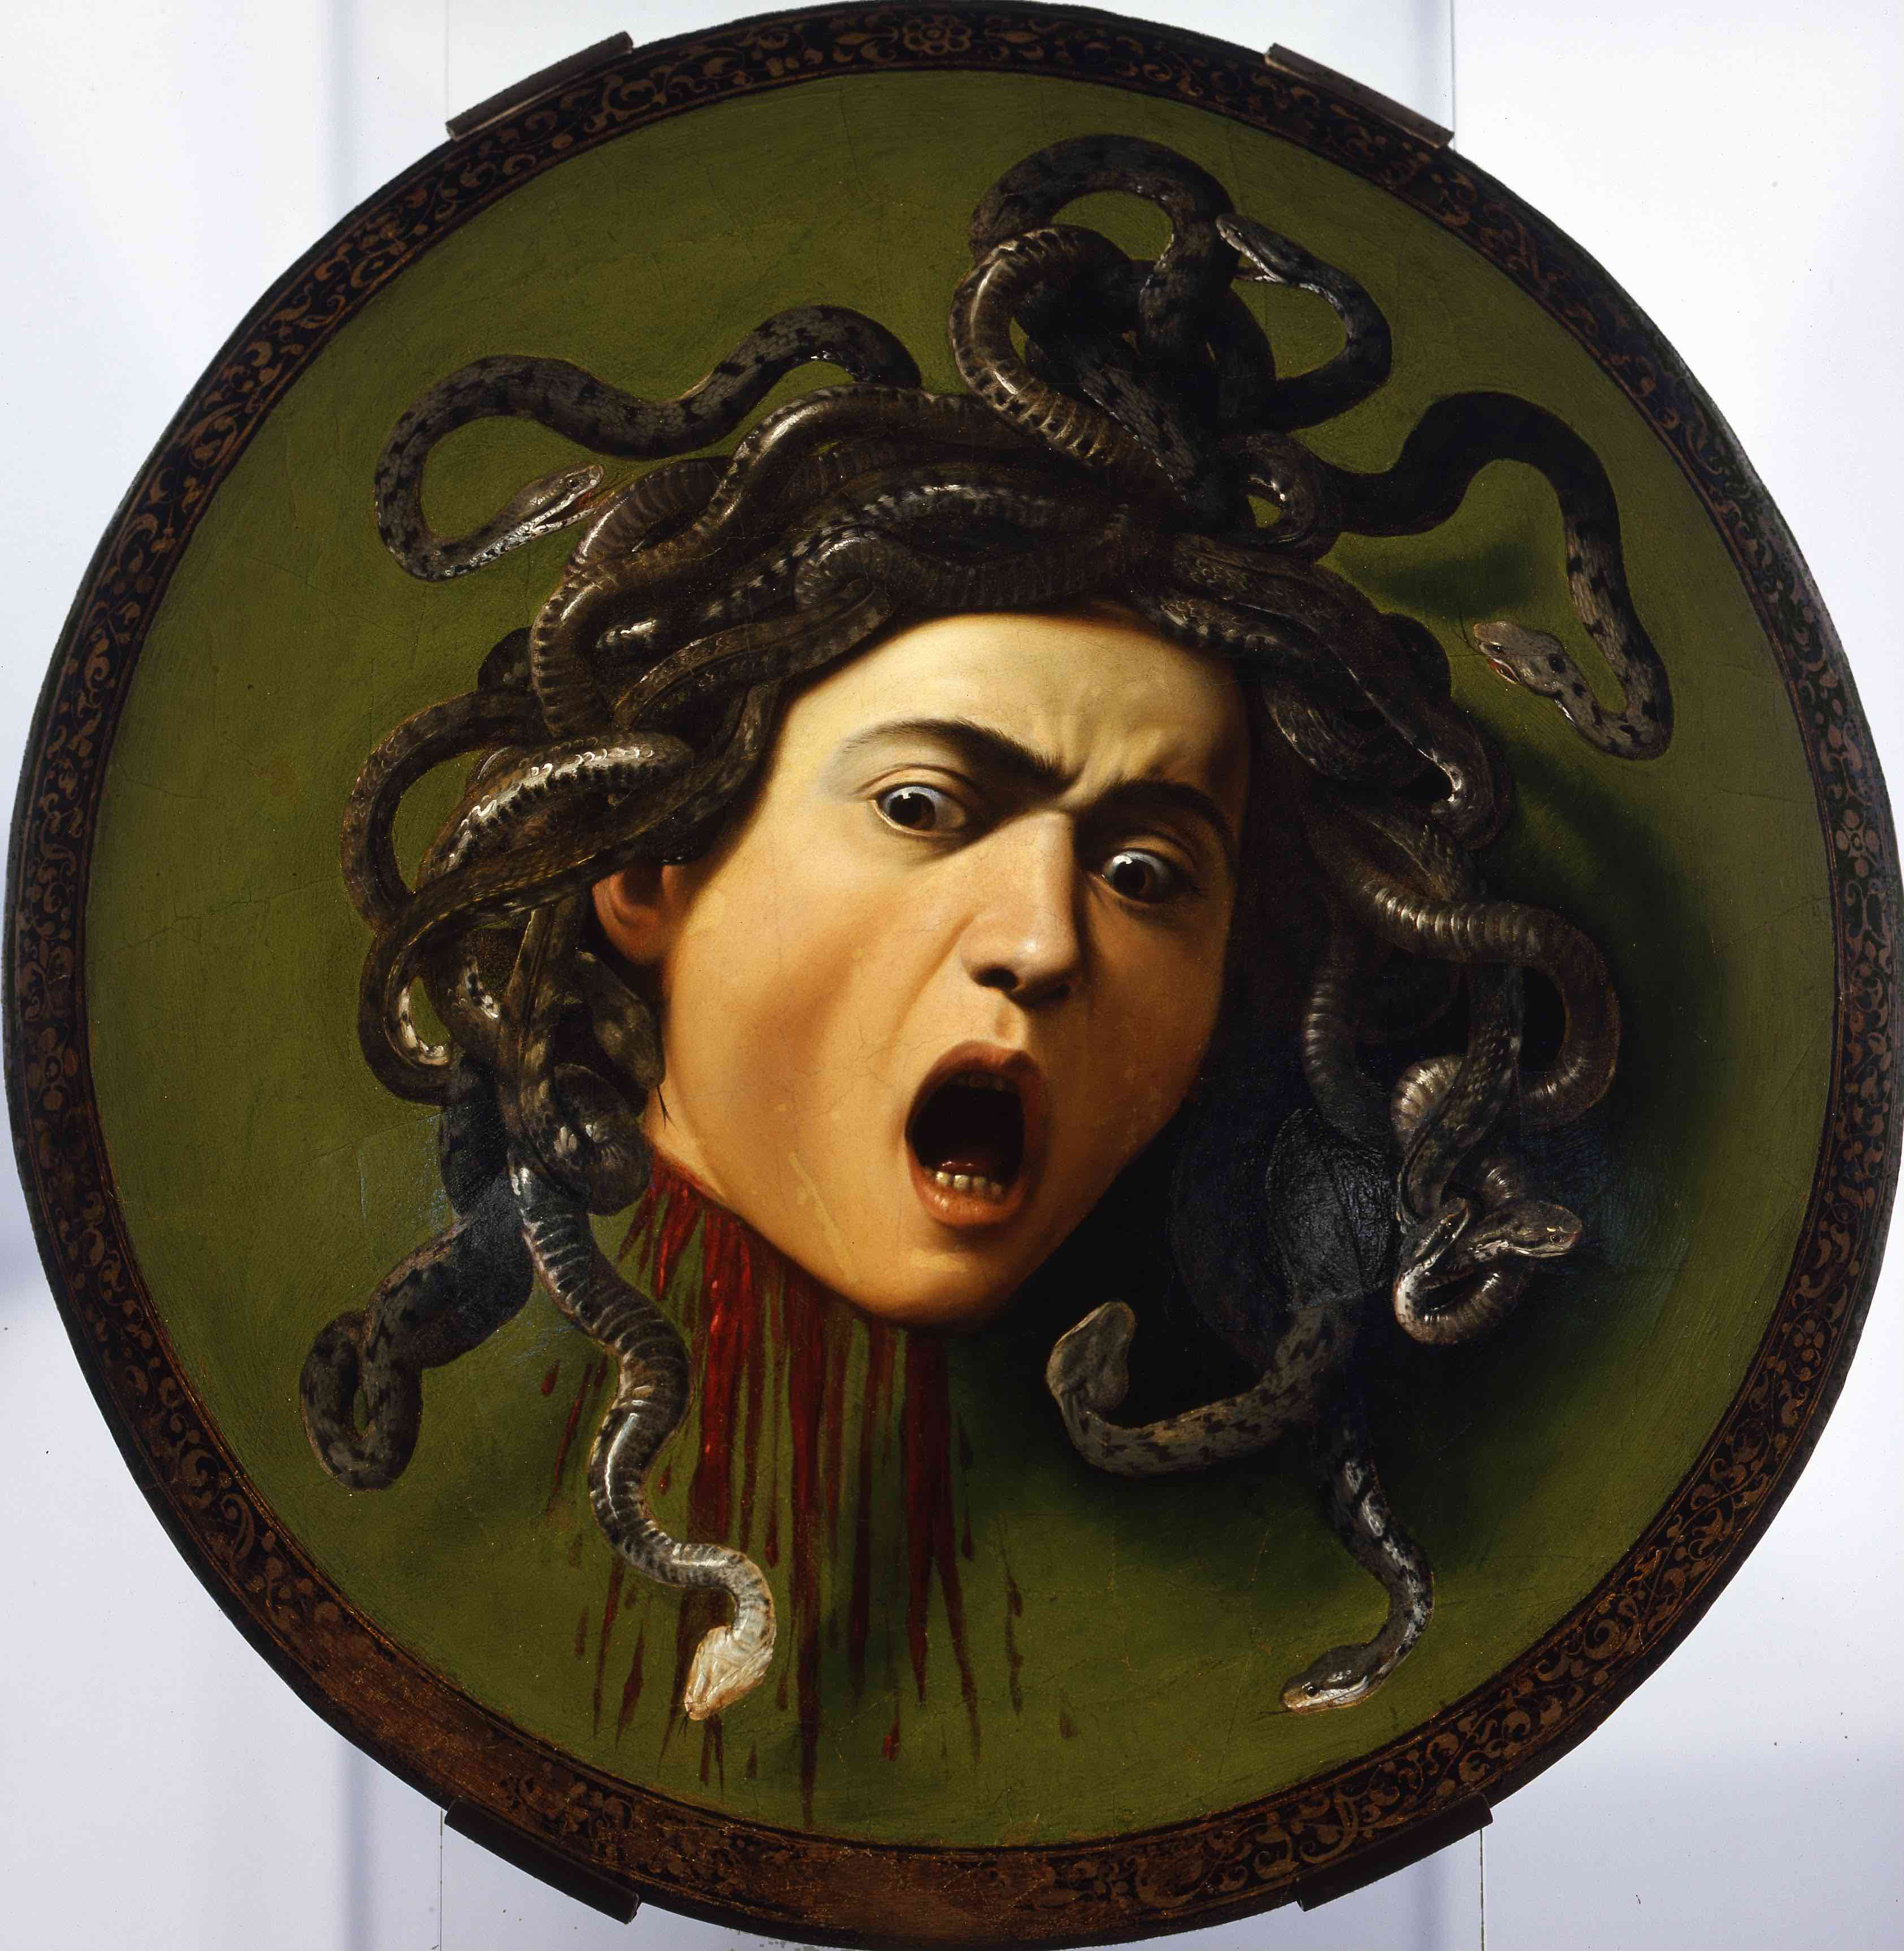 10. Caravaggio Medusa